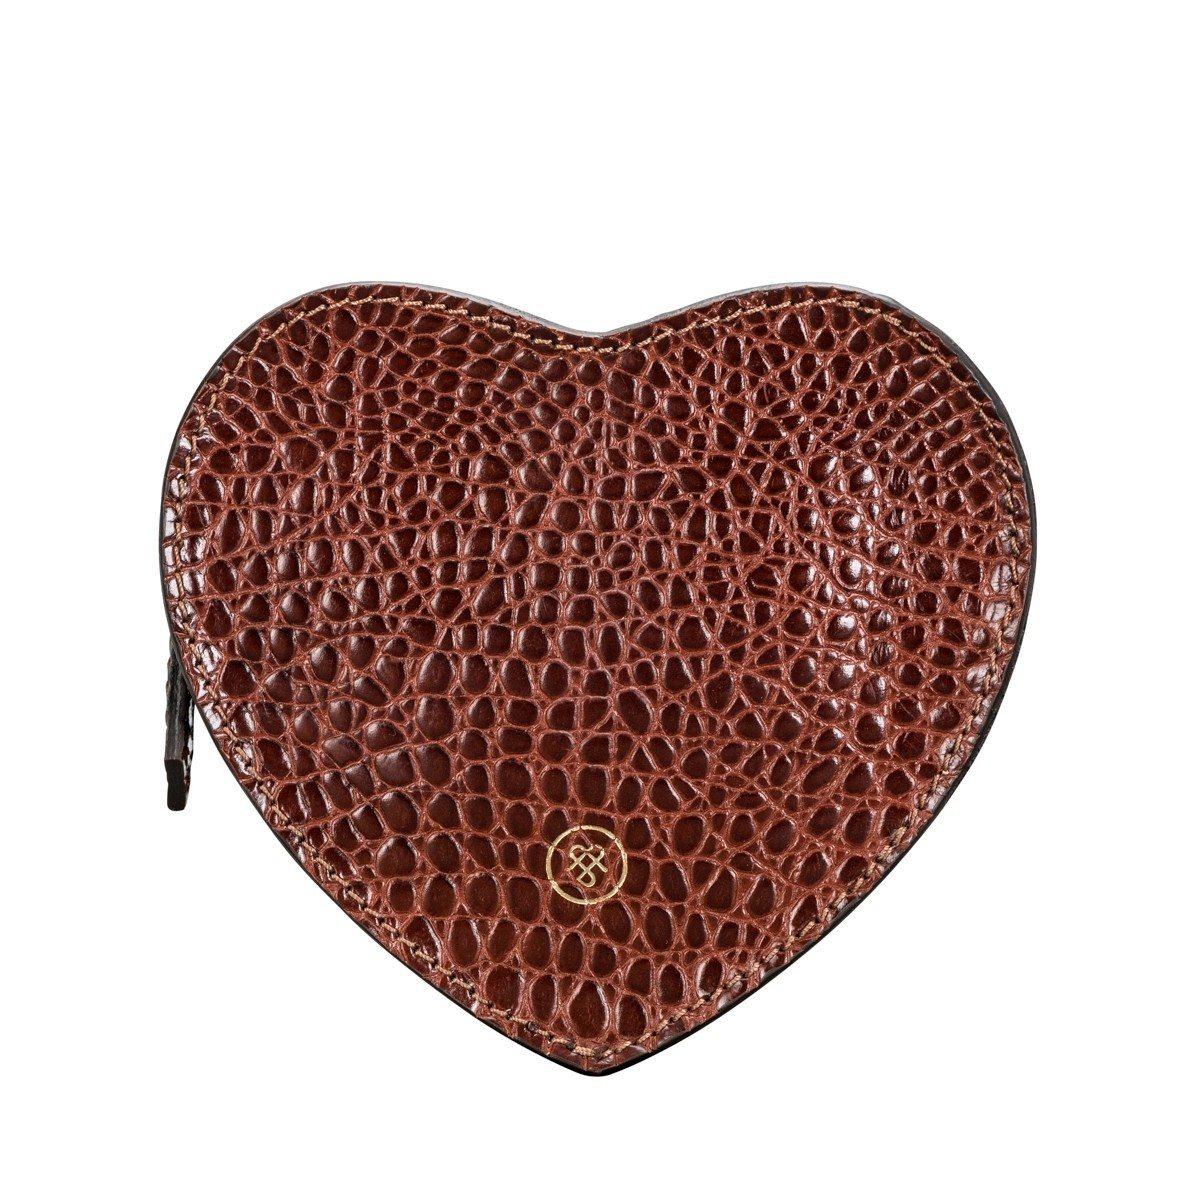 heart symbol of love